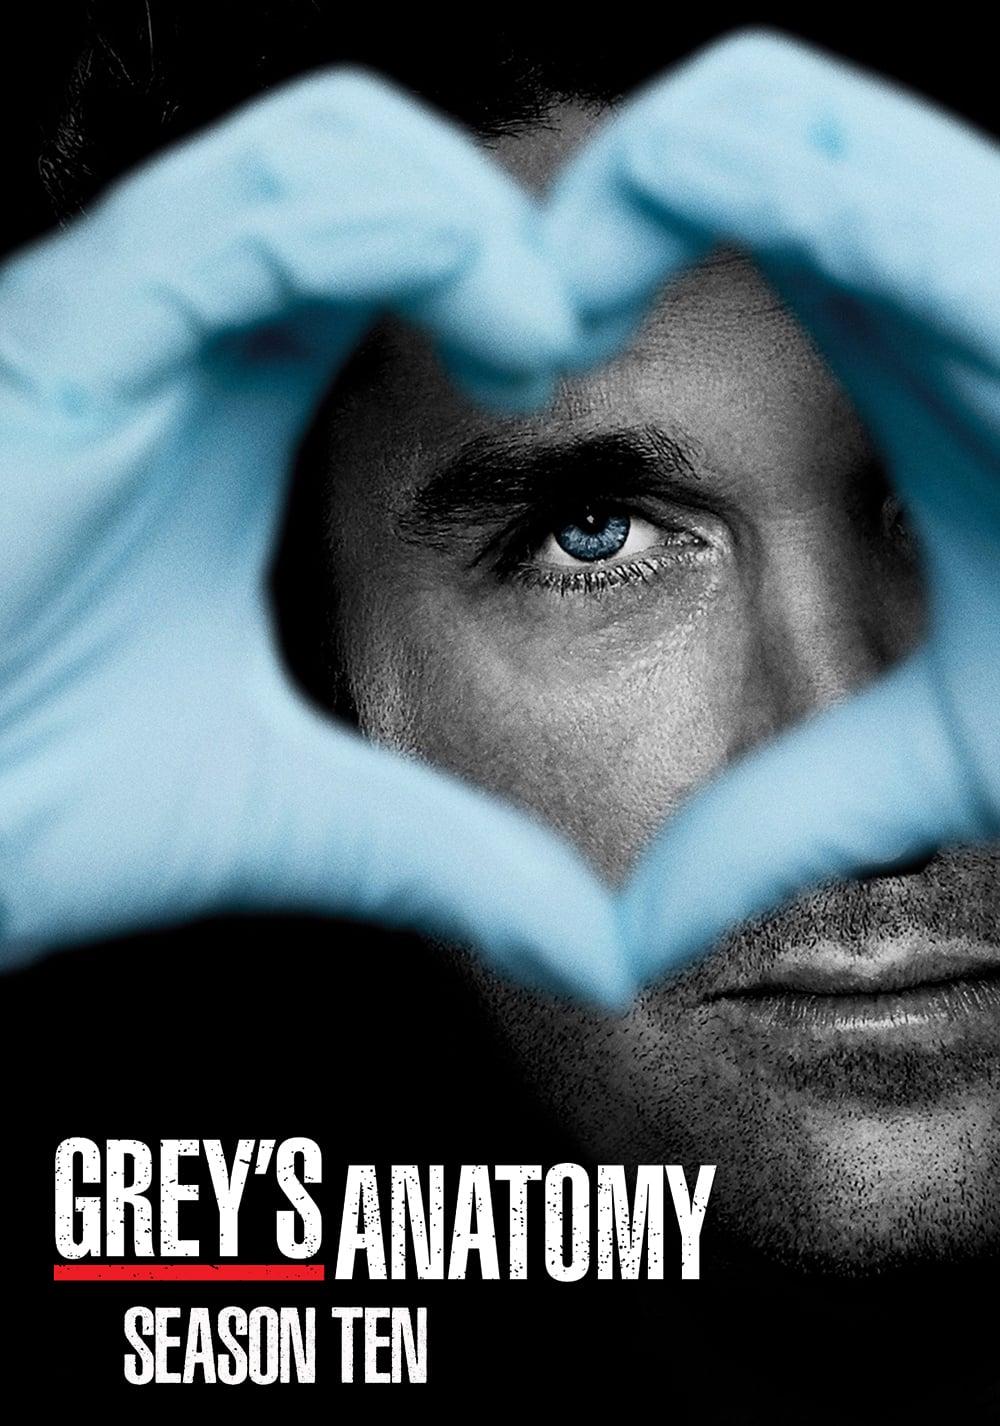 15 Temporada De Grey's Anatomy Assistir grey's anatomy temporada 10 - adorocinema